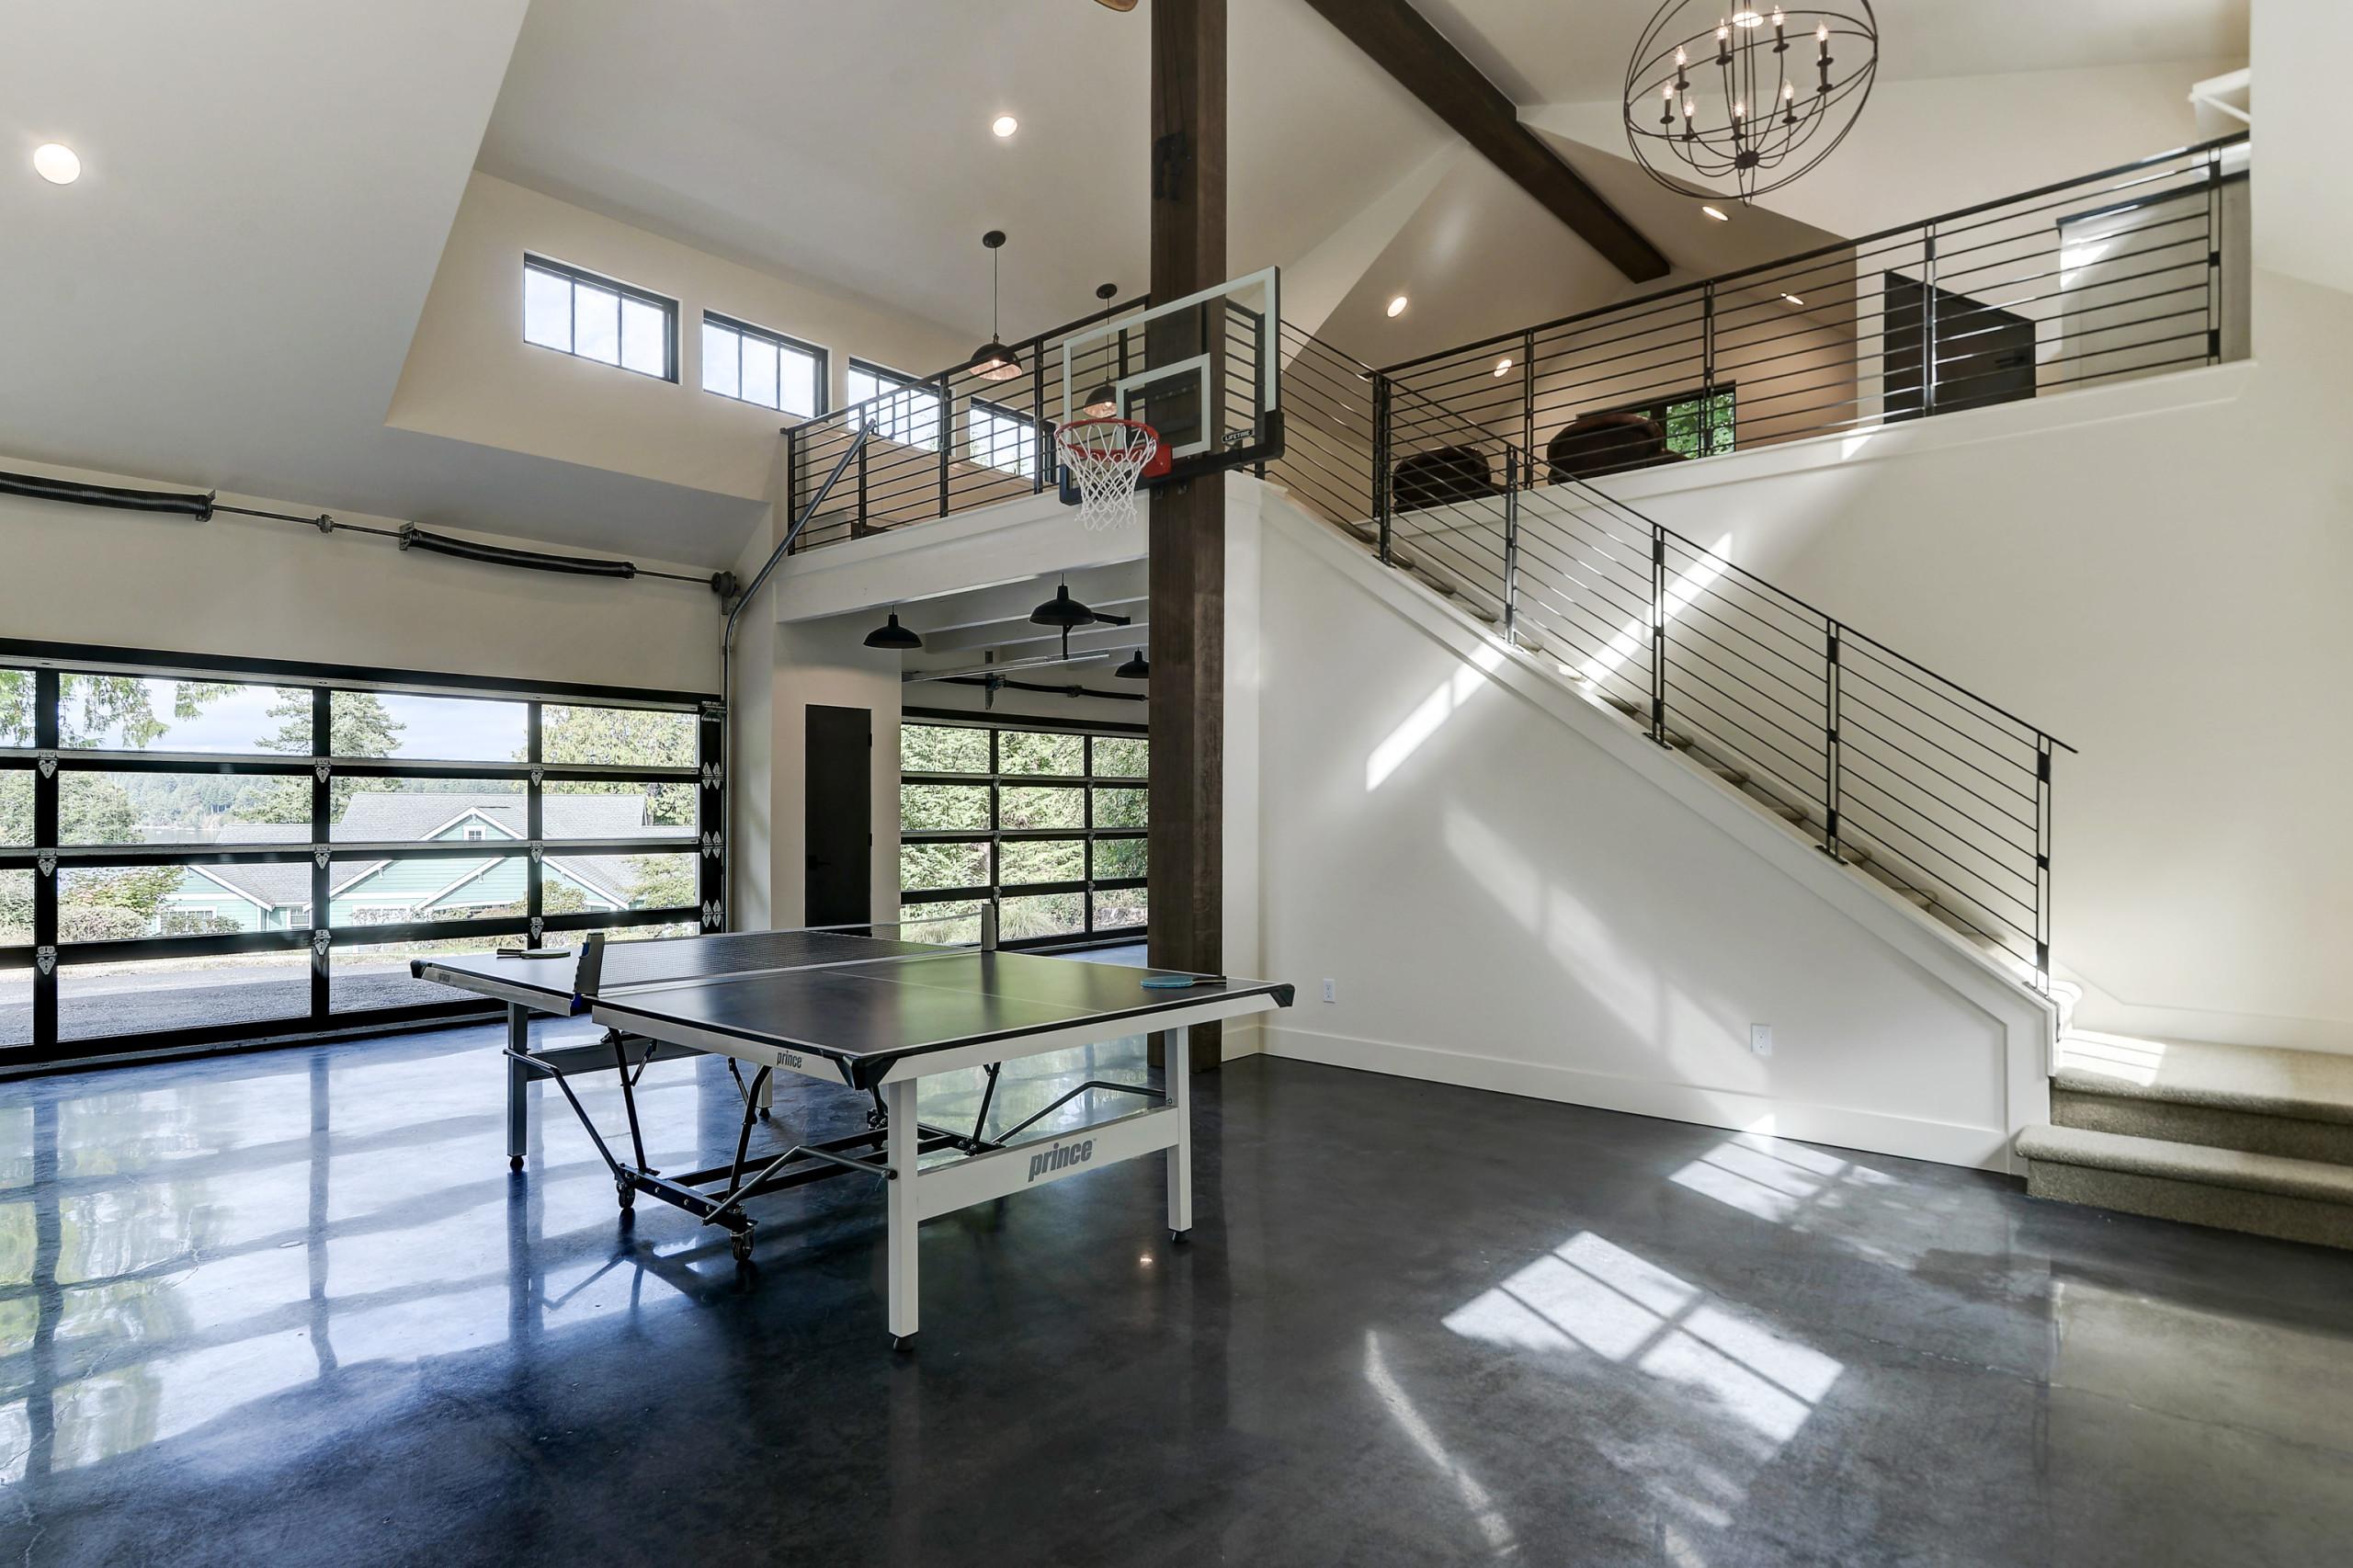 Garage Siding/Interior Remodel - Olympia, WA